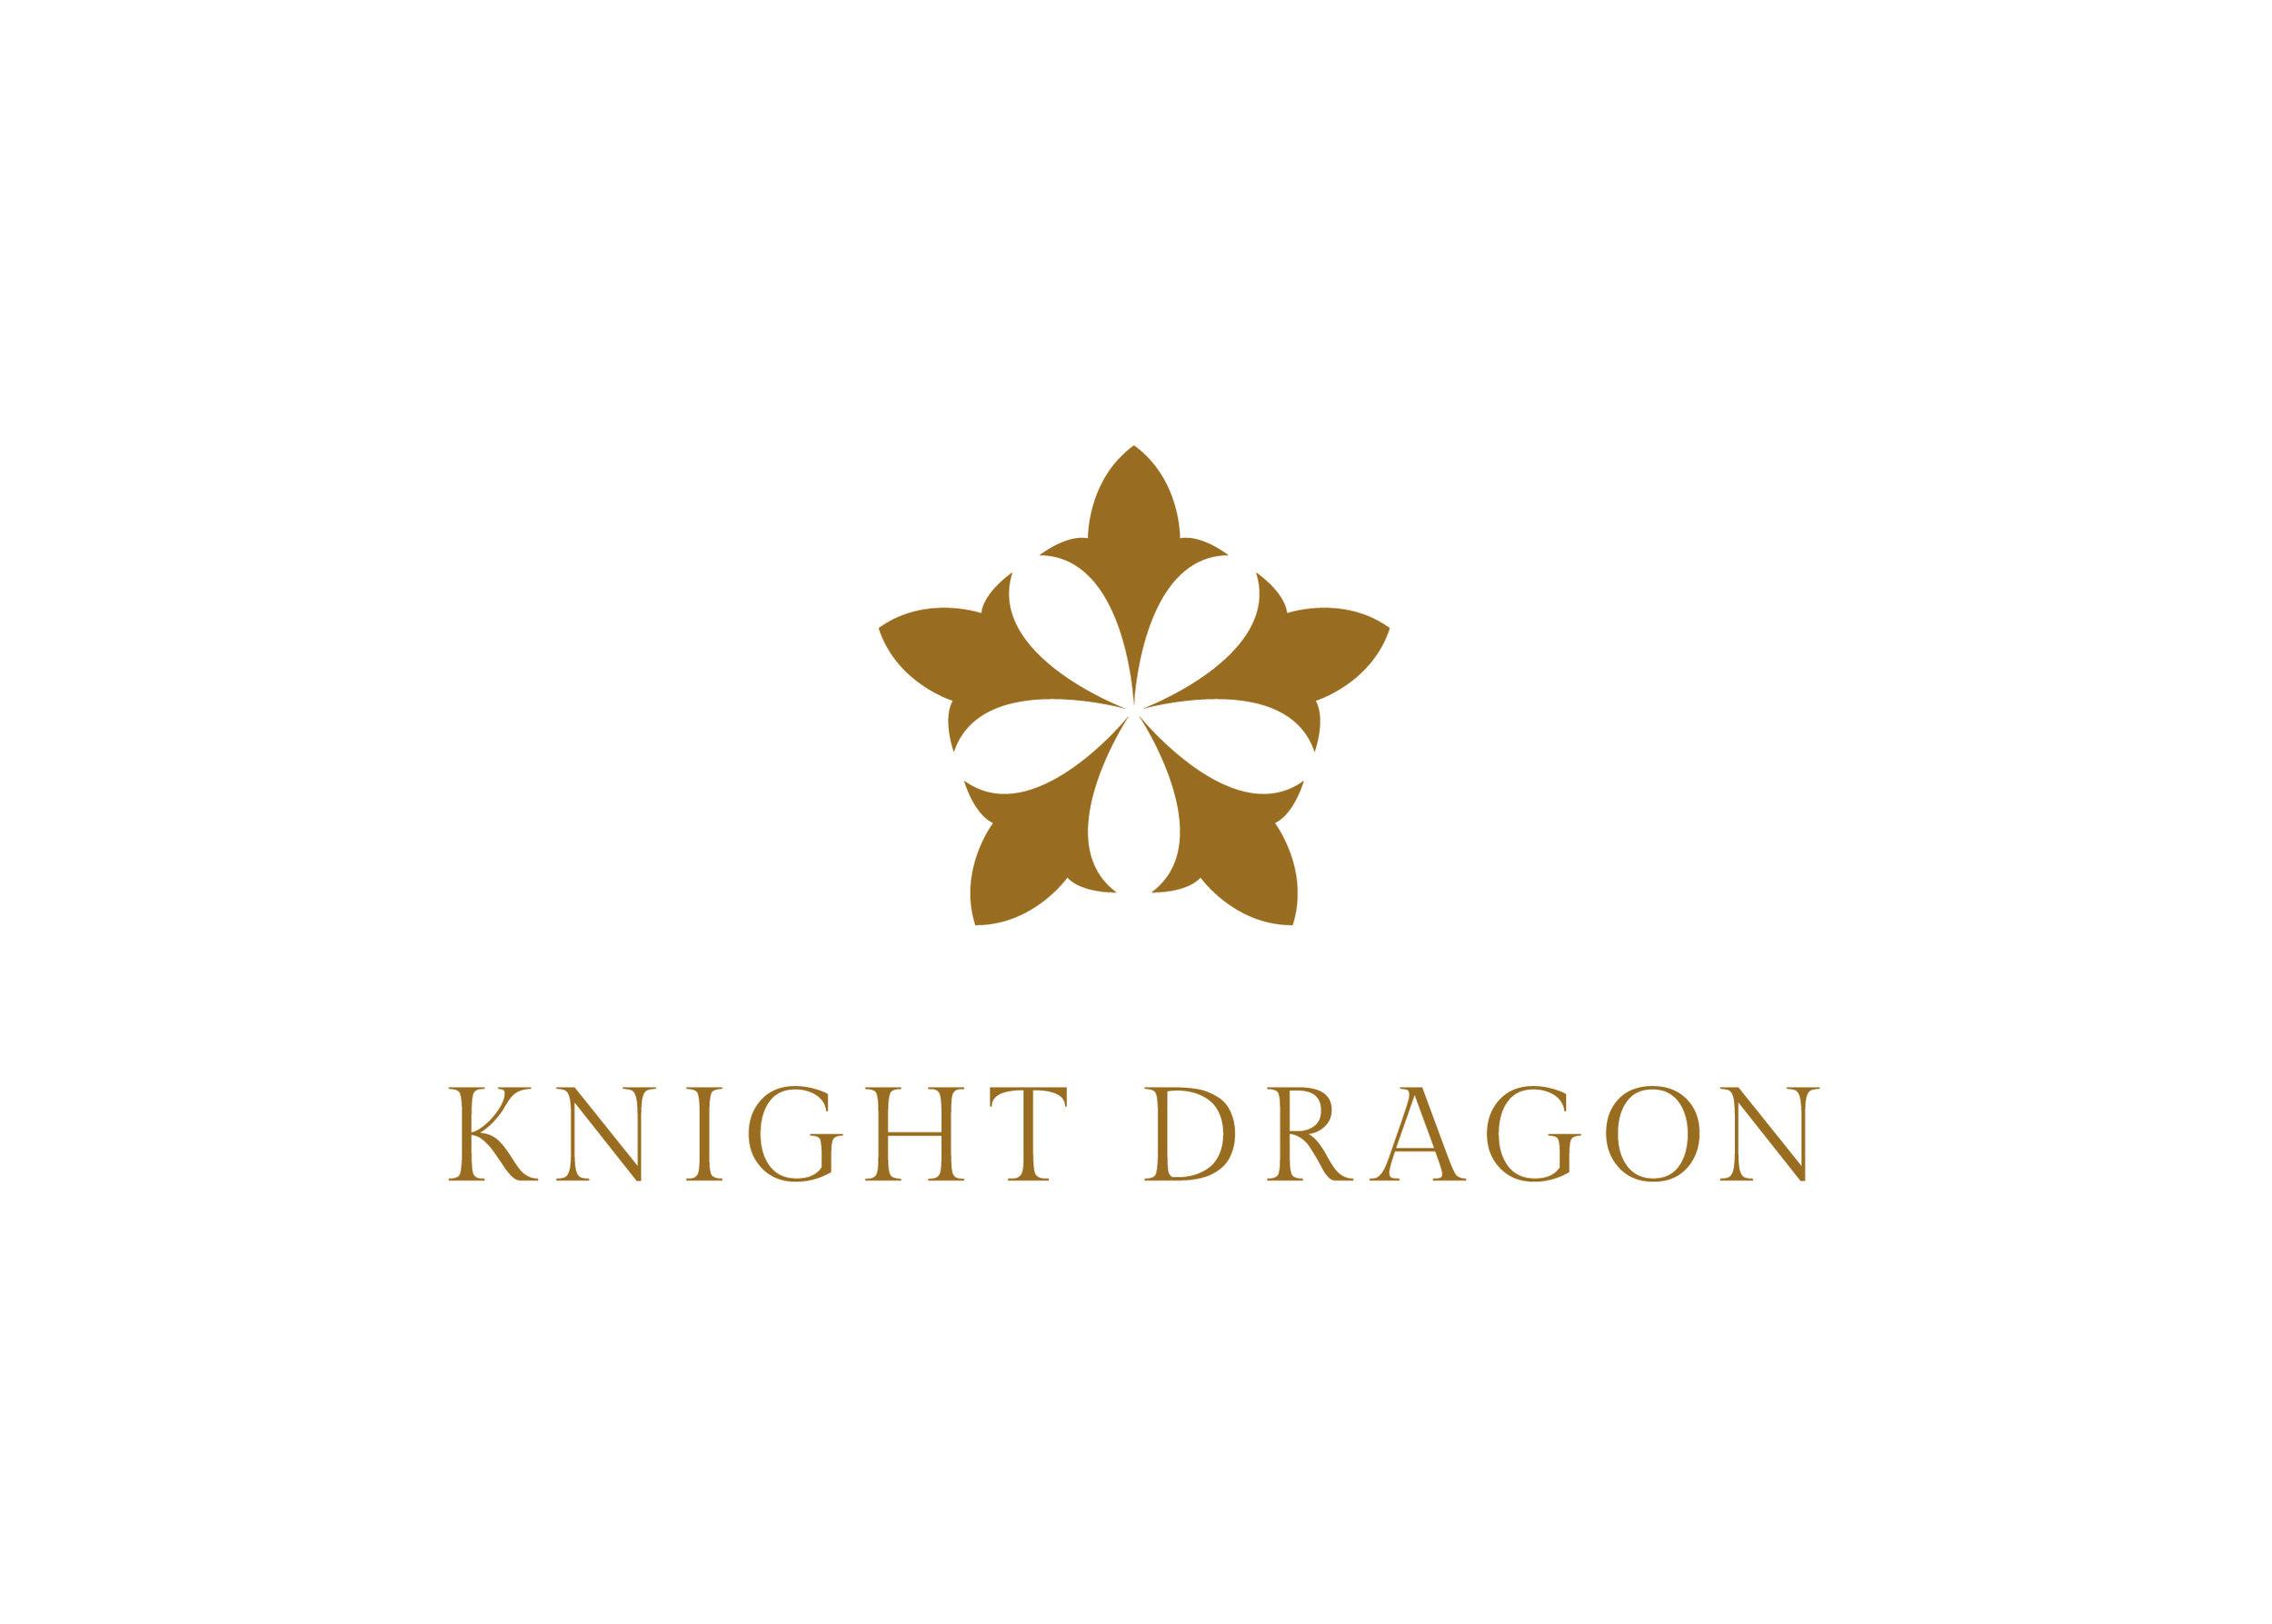 Knight_Dragon.jpg